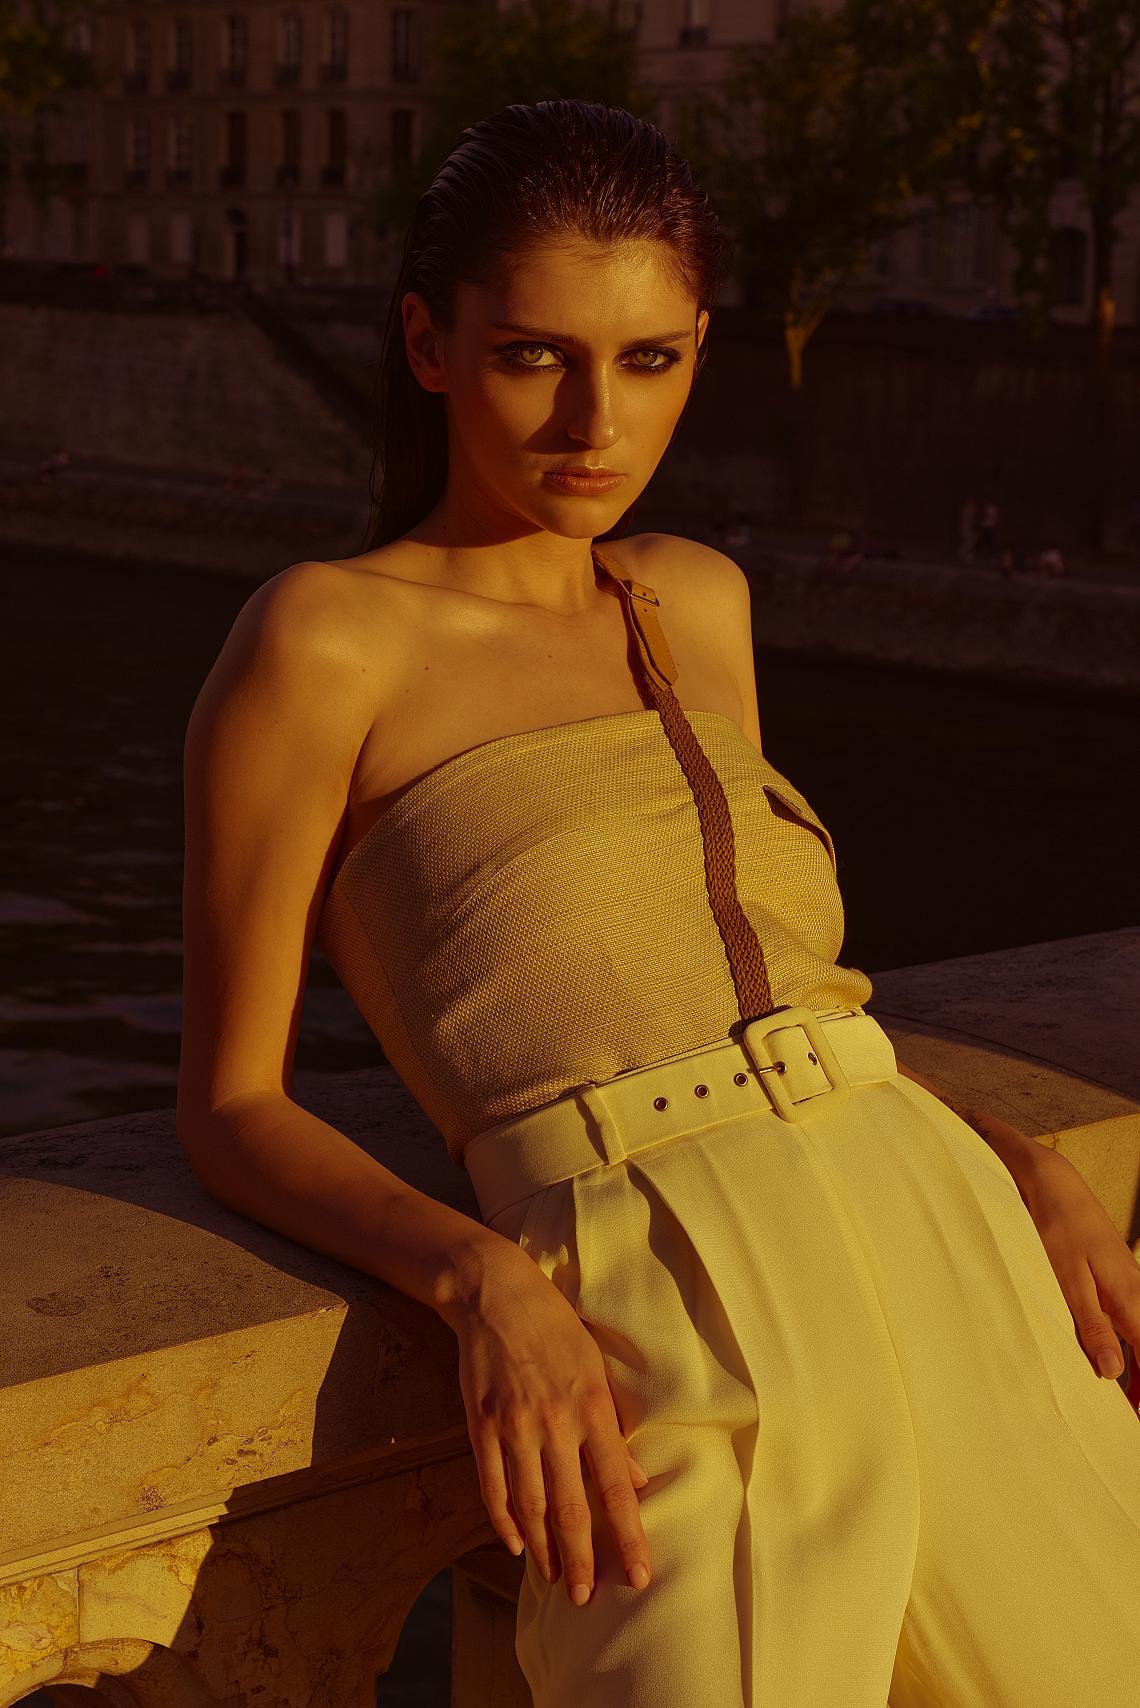 "<p>Топ Célia Darling Vintage, панталони Christian Dior, обувки Célia Darling Vintage</p><p><br></p><p>Фотографии Mathieu Puga, <a href=""https://www.instagram.com/mathieu_puga/"">https://www.instagram.com/mathieu_puga/</a>; стилист Fifivintage, <a href=""https://www.instagram.com/fifivintage/"">https://www.instagram.com/fifivintage/</a>; коса и грим Kasia Furtak, <a href=""https://www.instagram.com/kasiafurtak/"">https://www.instagram.com/kasiafurtak/</a>; модел Sasha Rudakova, <a href=""https://www.instagram.com/sasha__rudakova/"">https://www.instagram.com/sasha__rudakova/</a>; @Karin Models</p>"